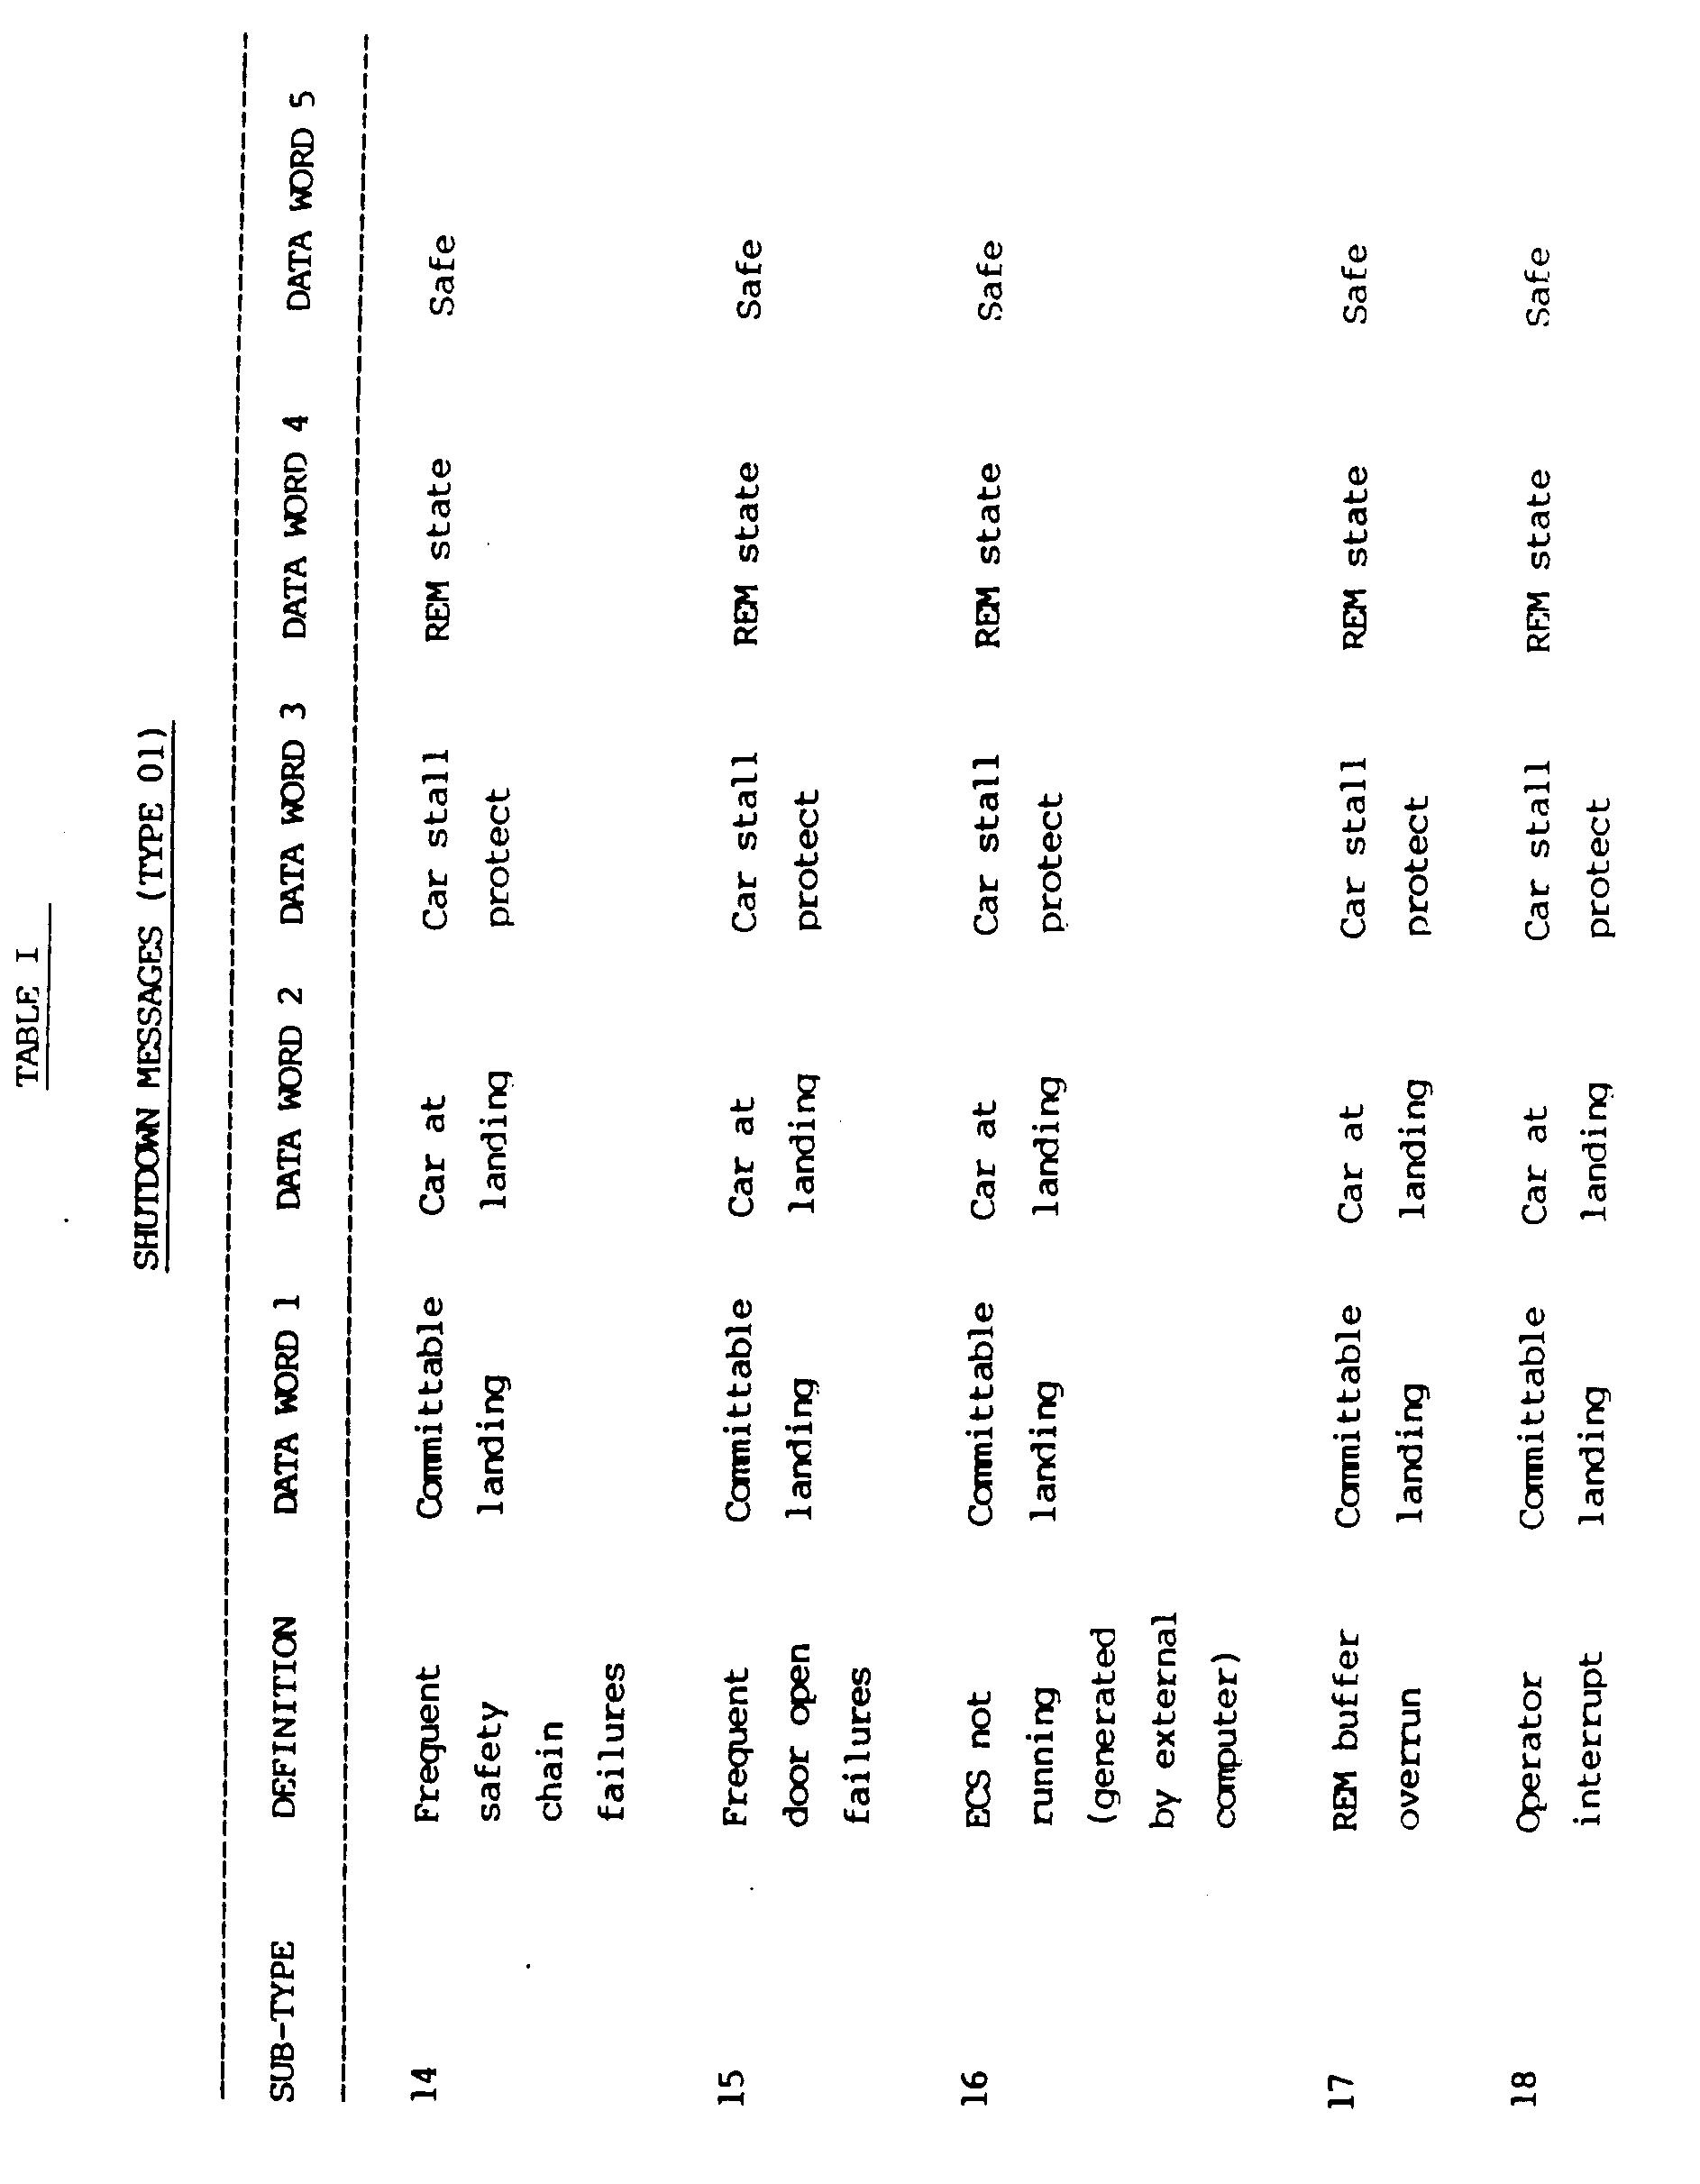 Ep0367388b1 Elevator Diagnostic Monitoring Apparatus Google Patents Ladder Logic Diagram For Figure Imgb0003